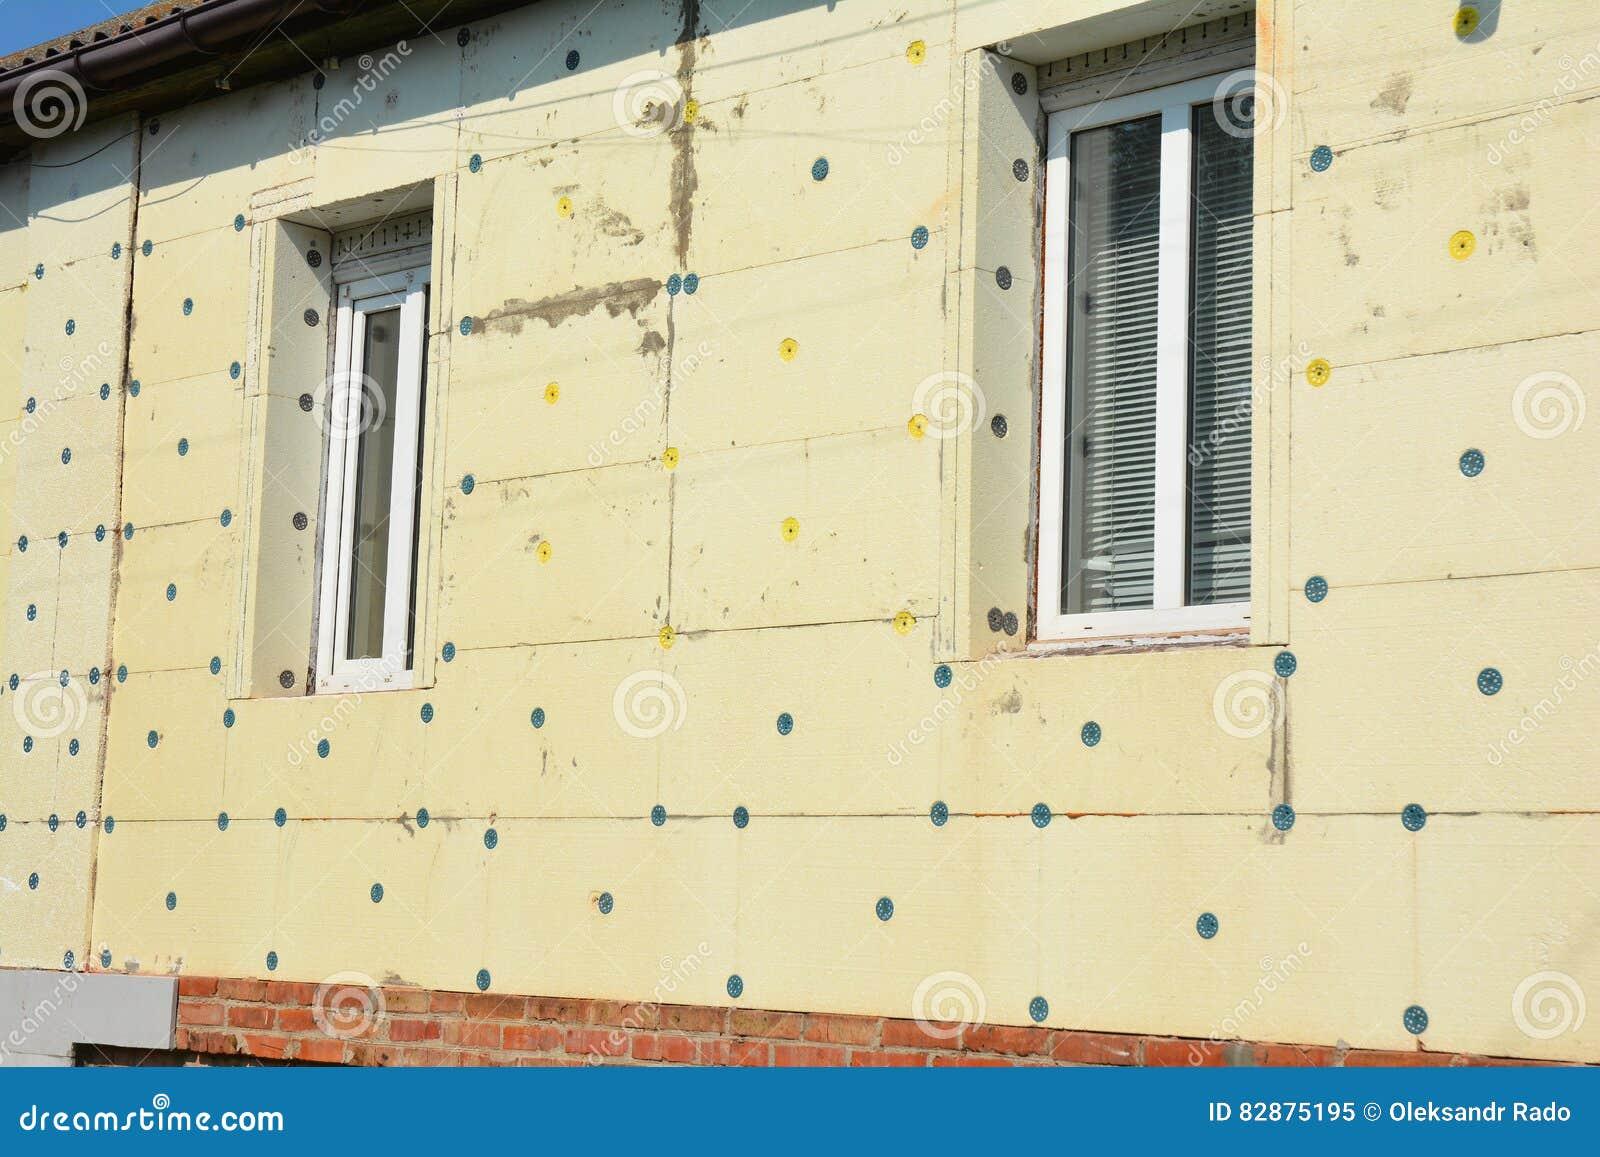 House renovation wall insulation styrofoam avoid for Styrofoam house construction